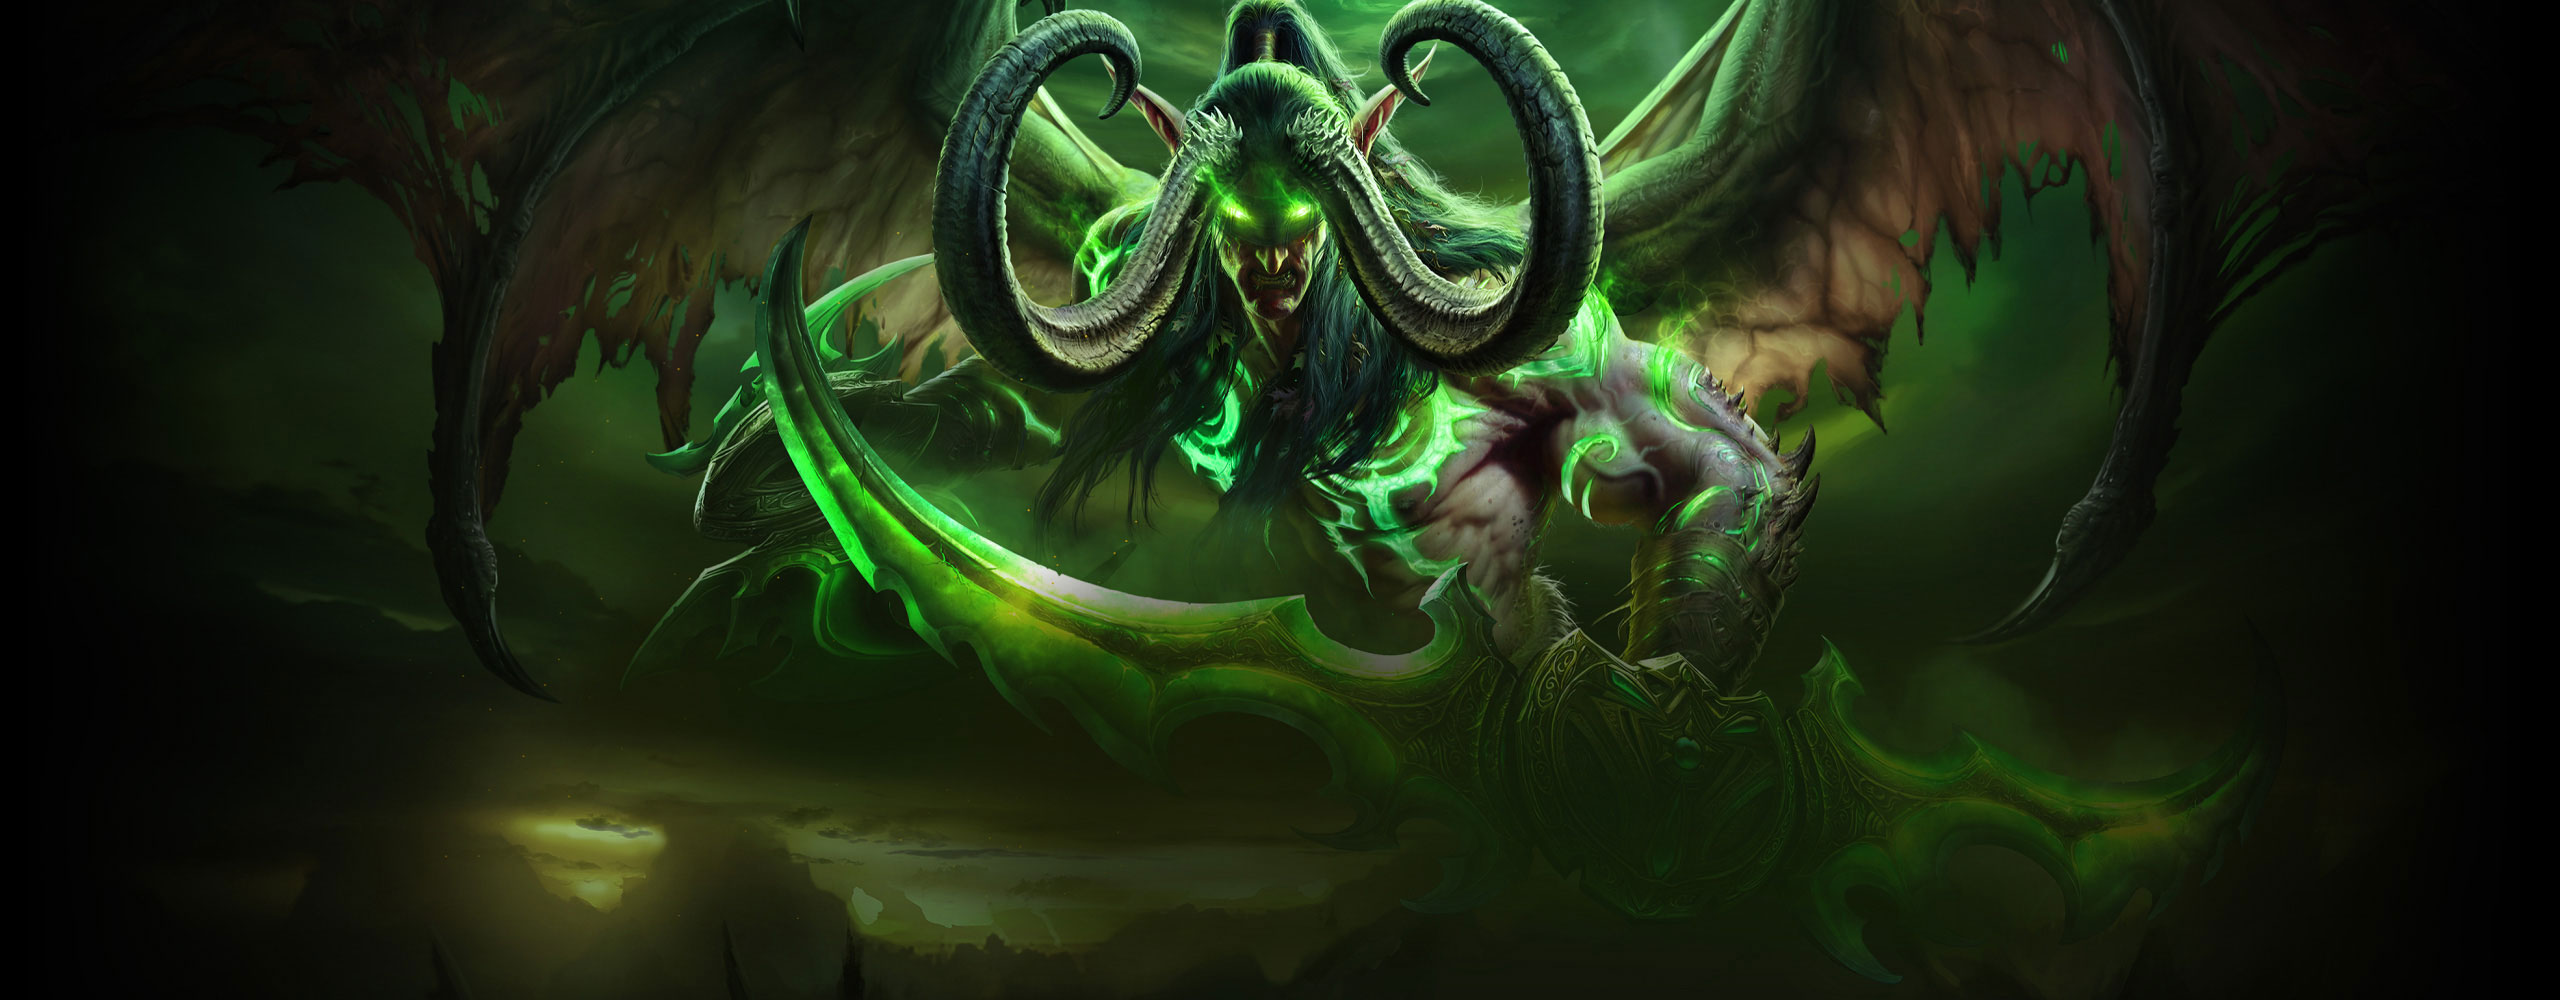 World of Warcraft: Legion Wallpapers